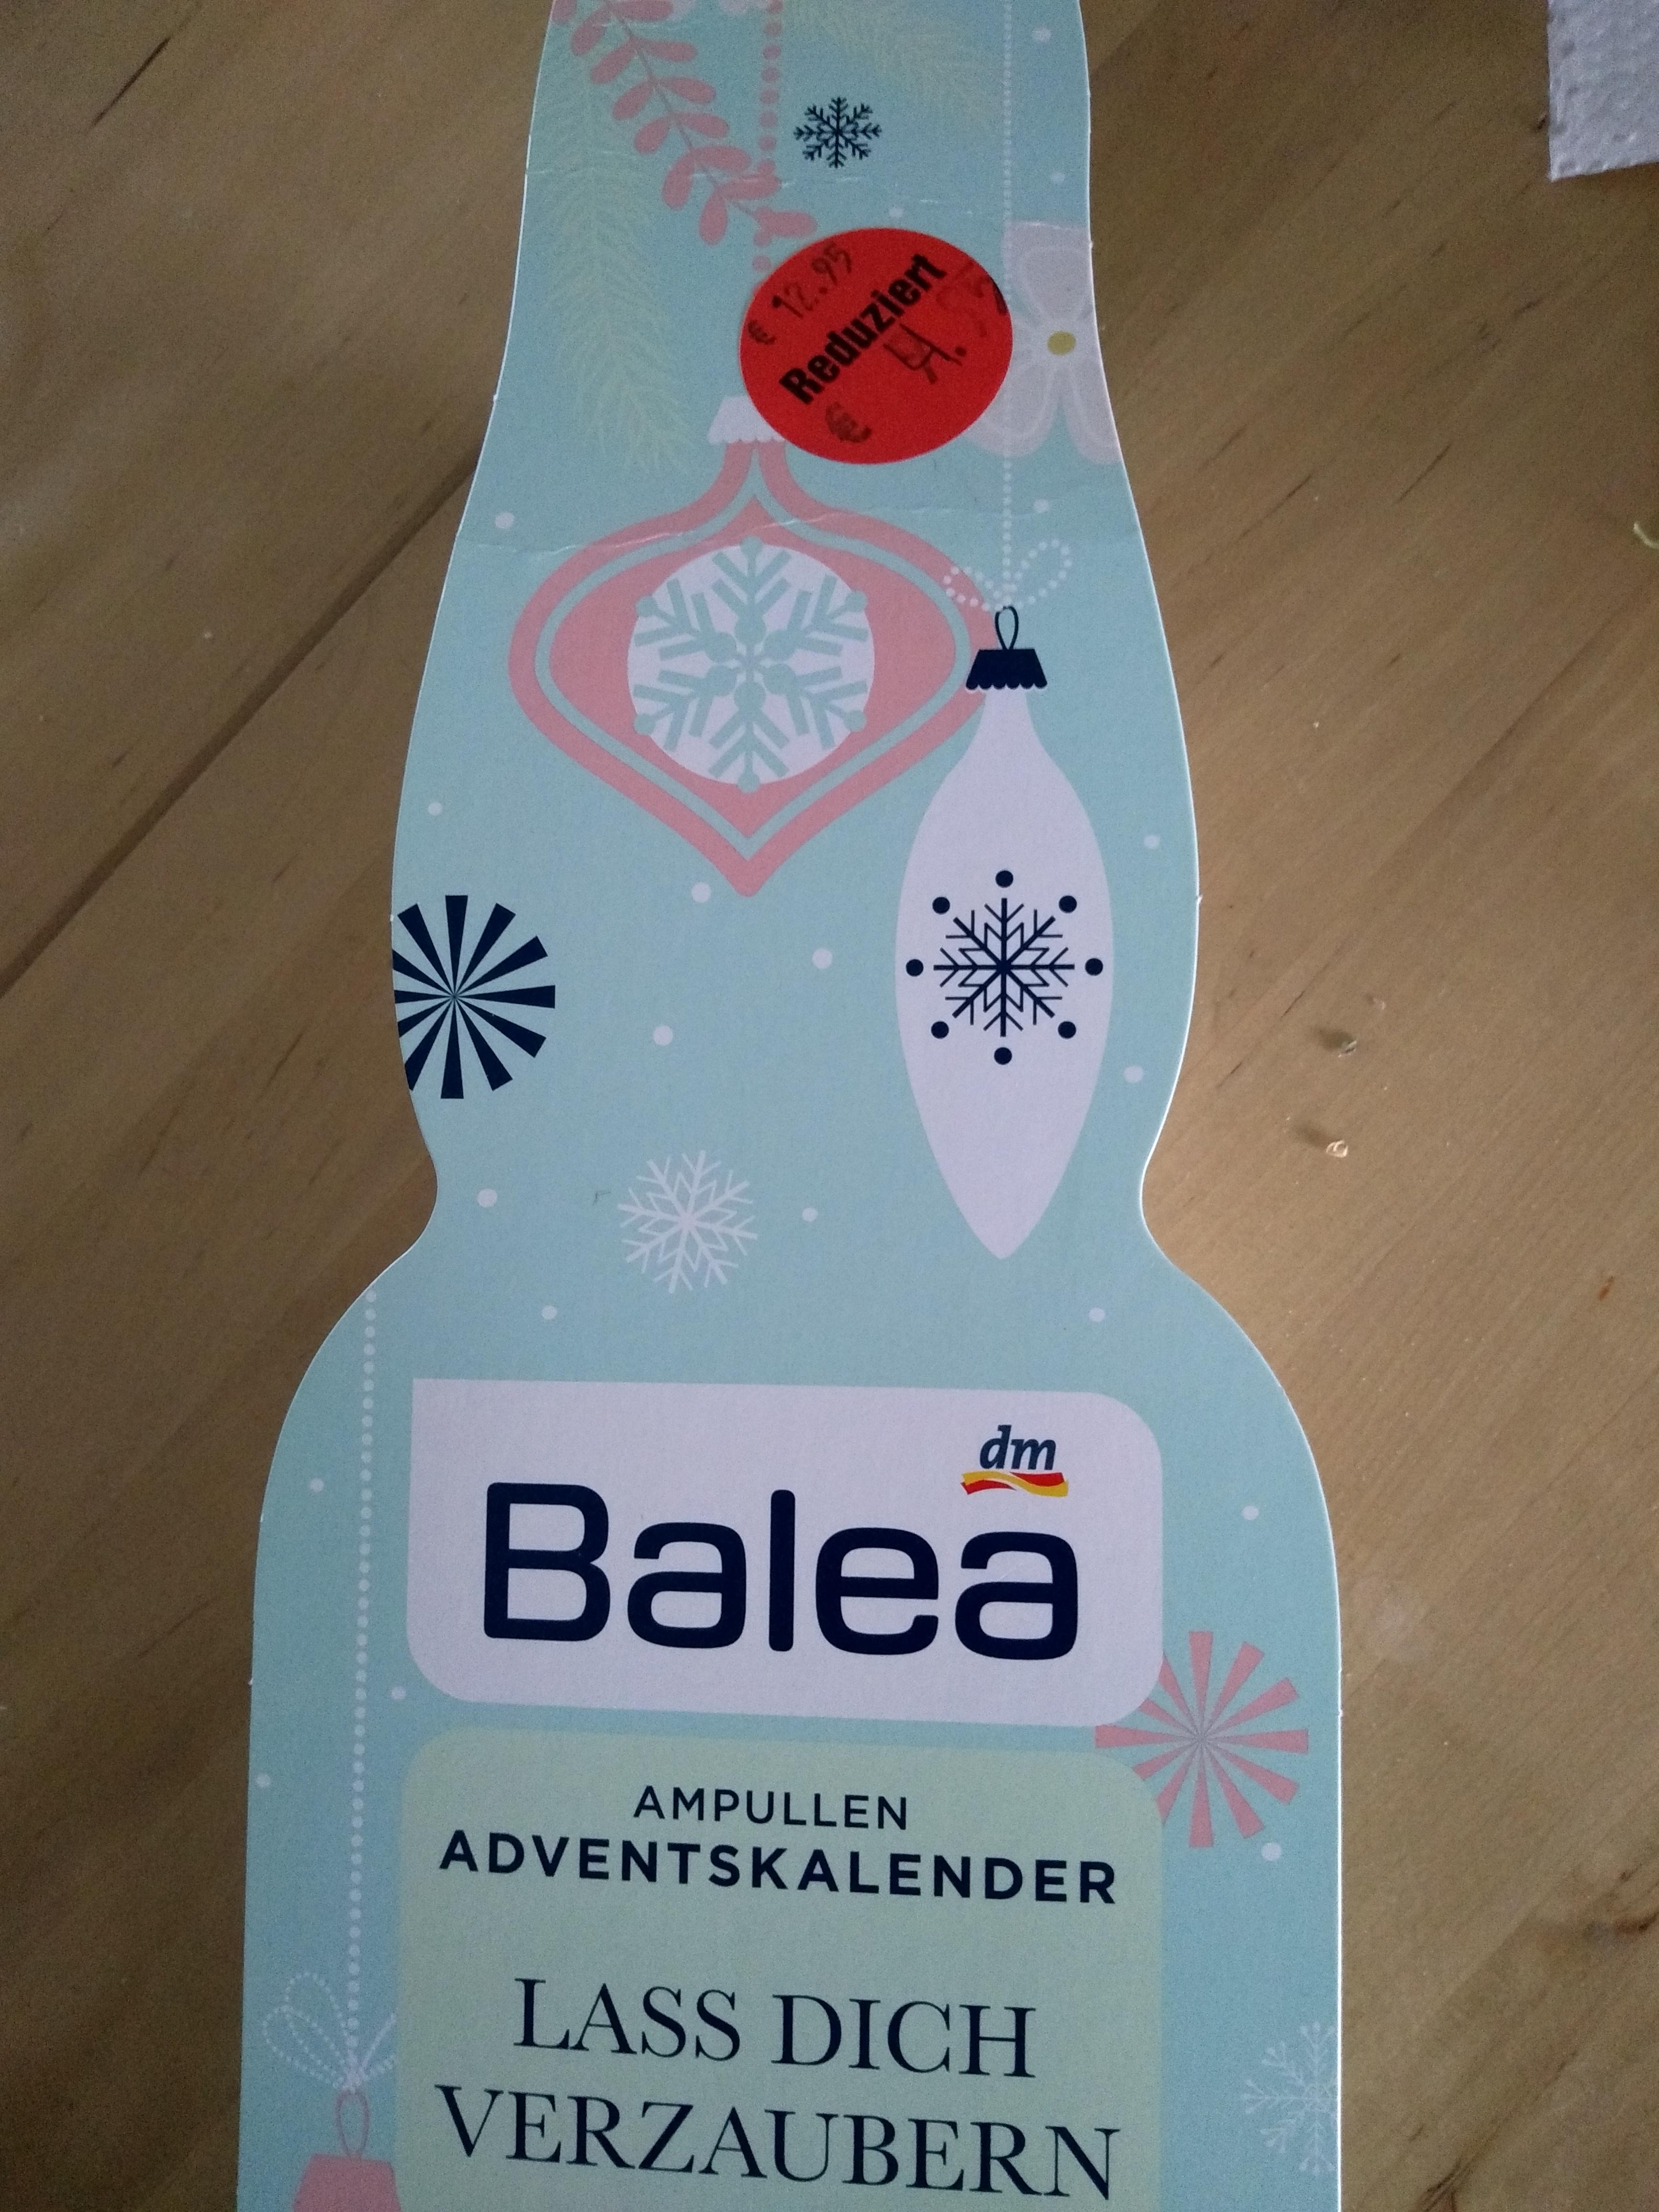 (Lokal) DM Schwerte Balea Ampullen Adventskalender 50 % reduziert